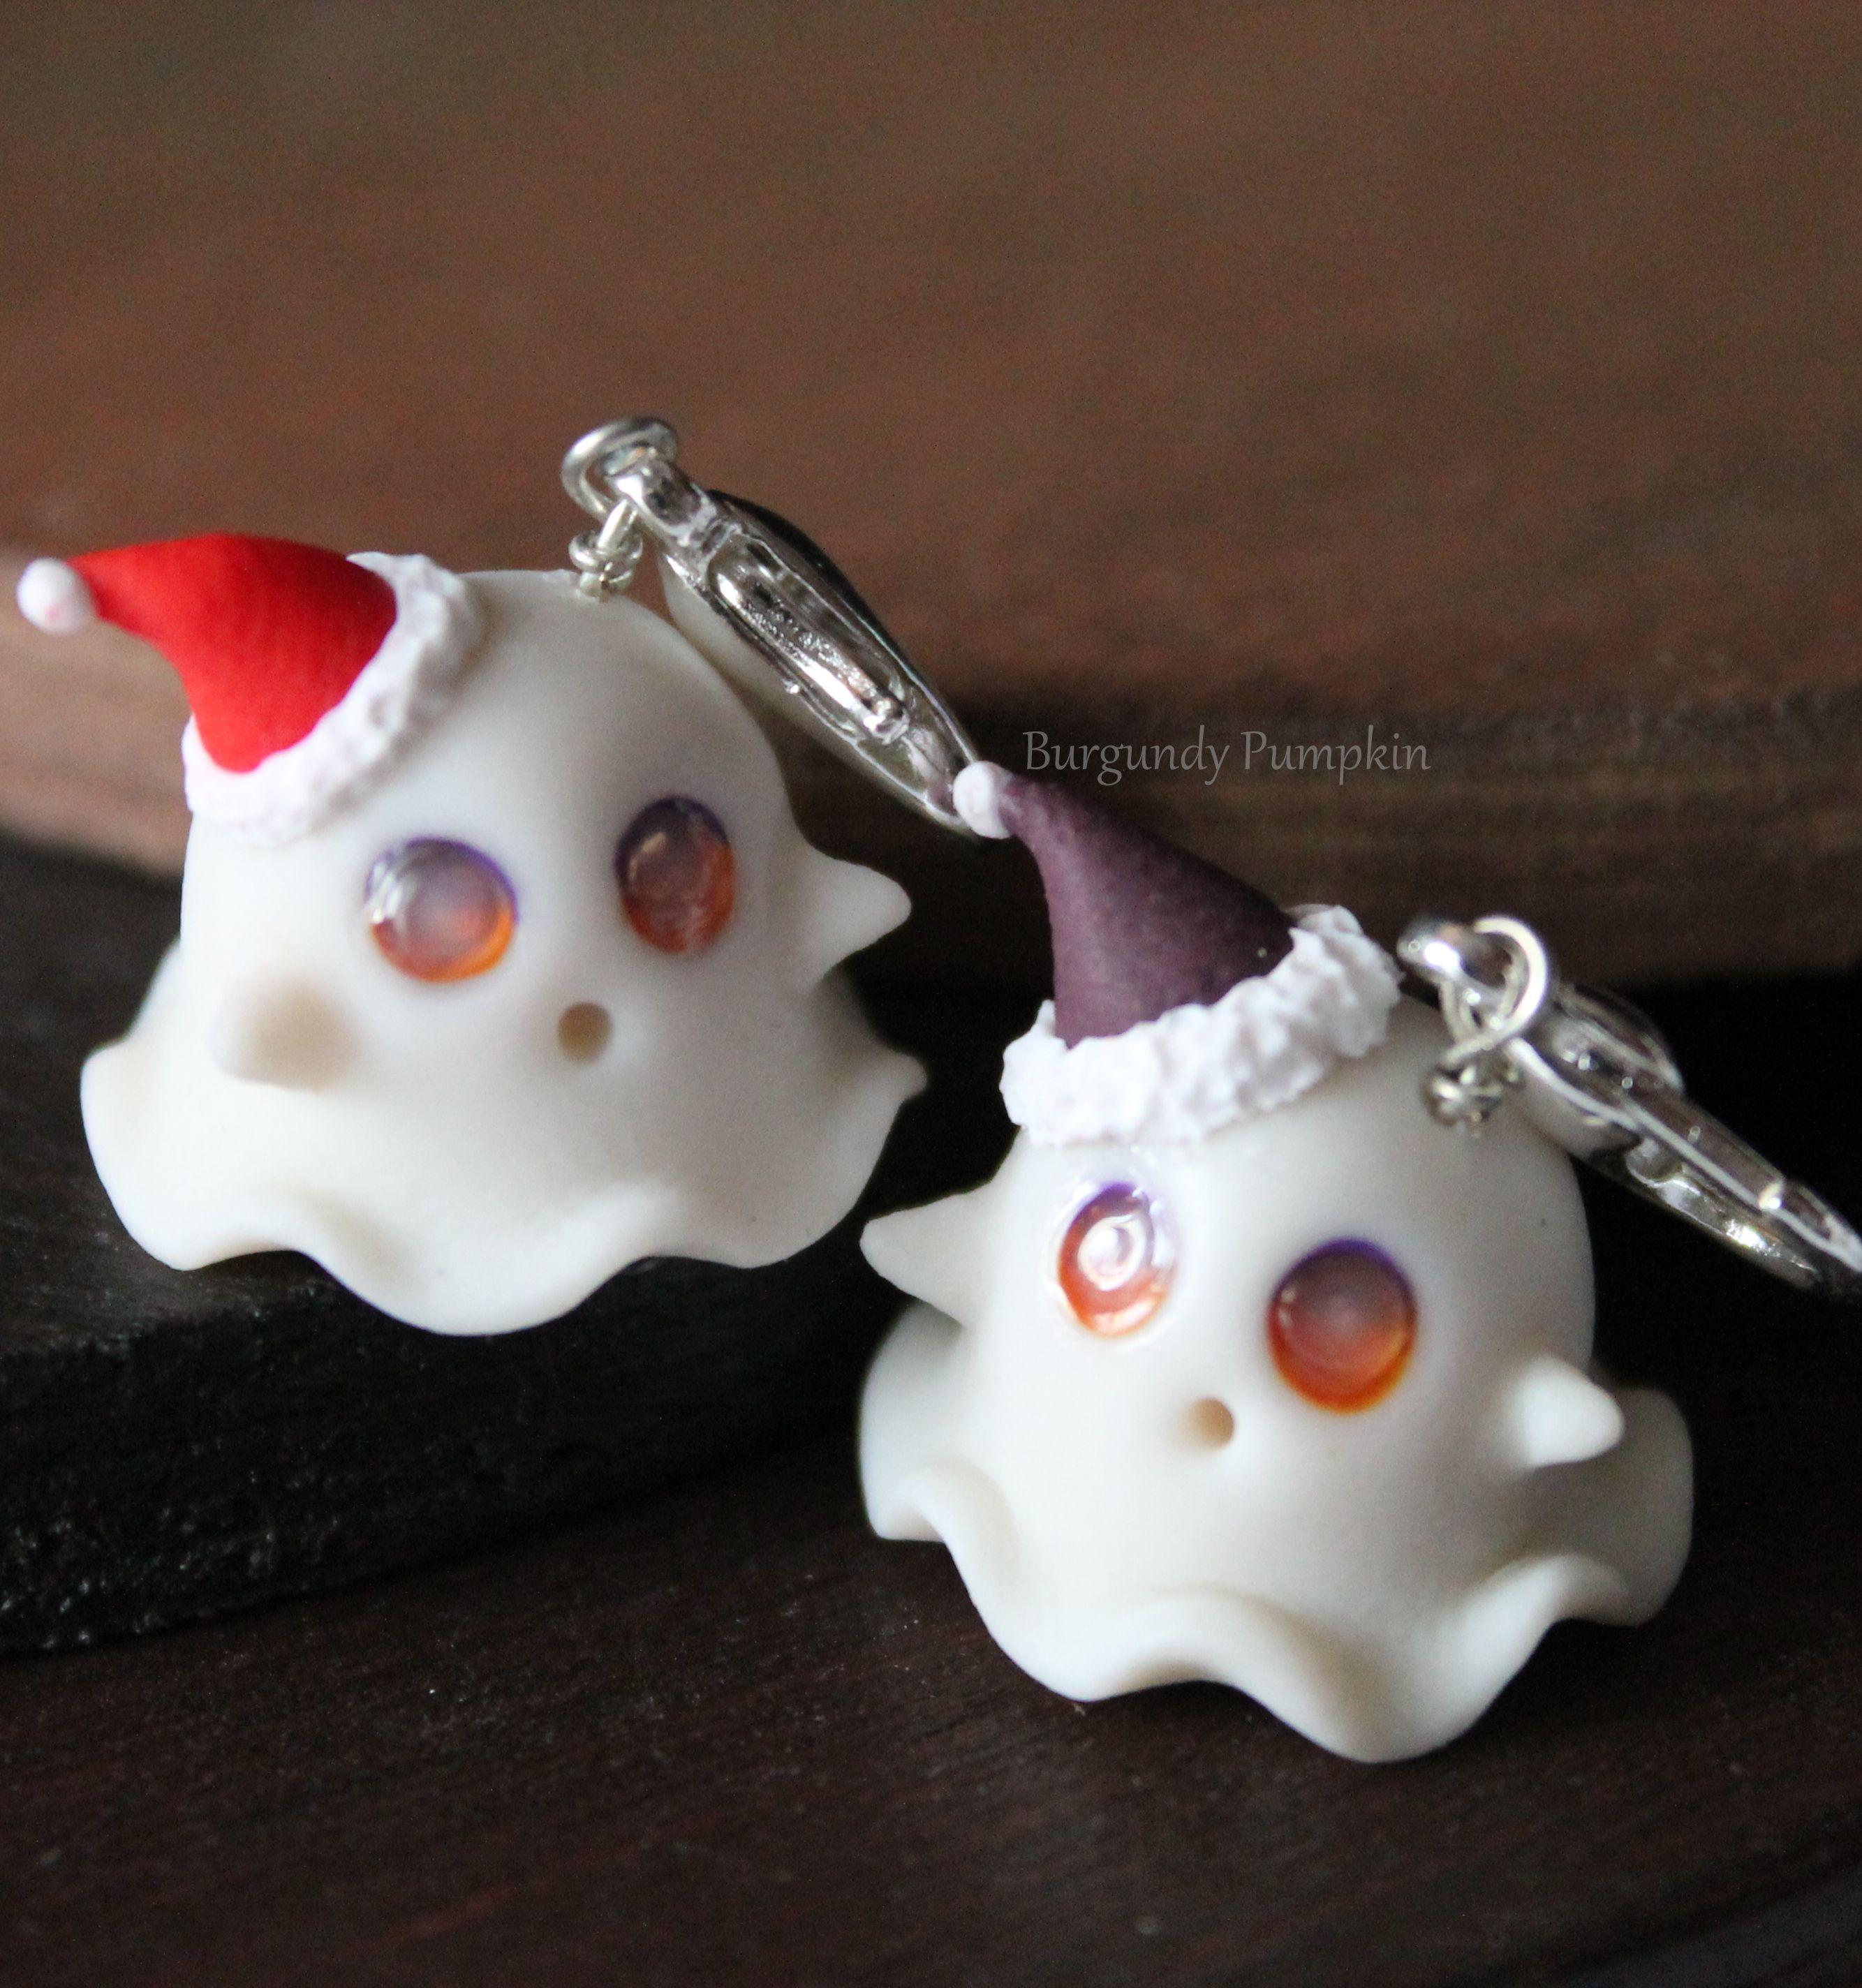 custom eye color glow in the dark ghost charm, handmade with polymer